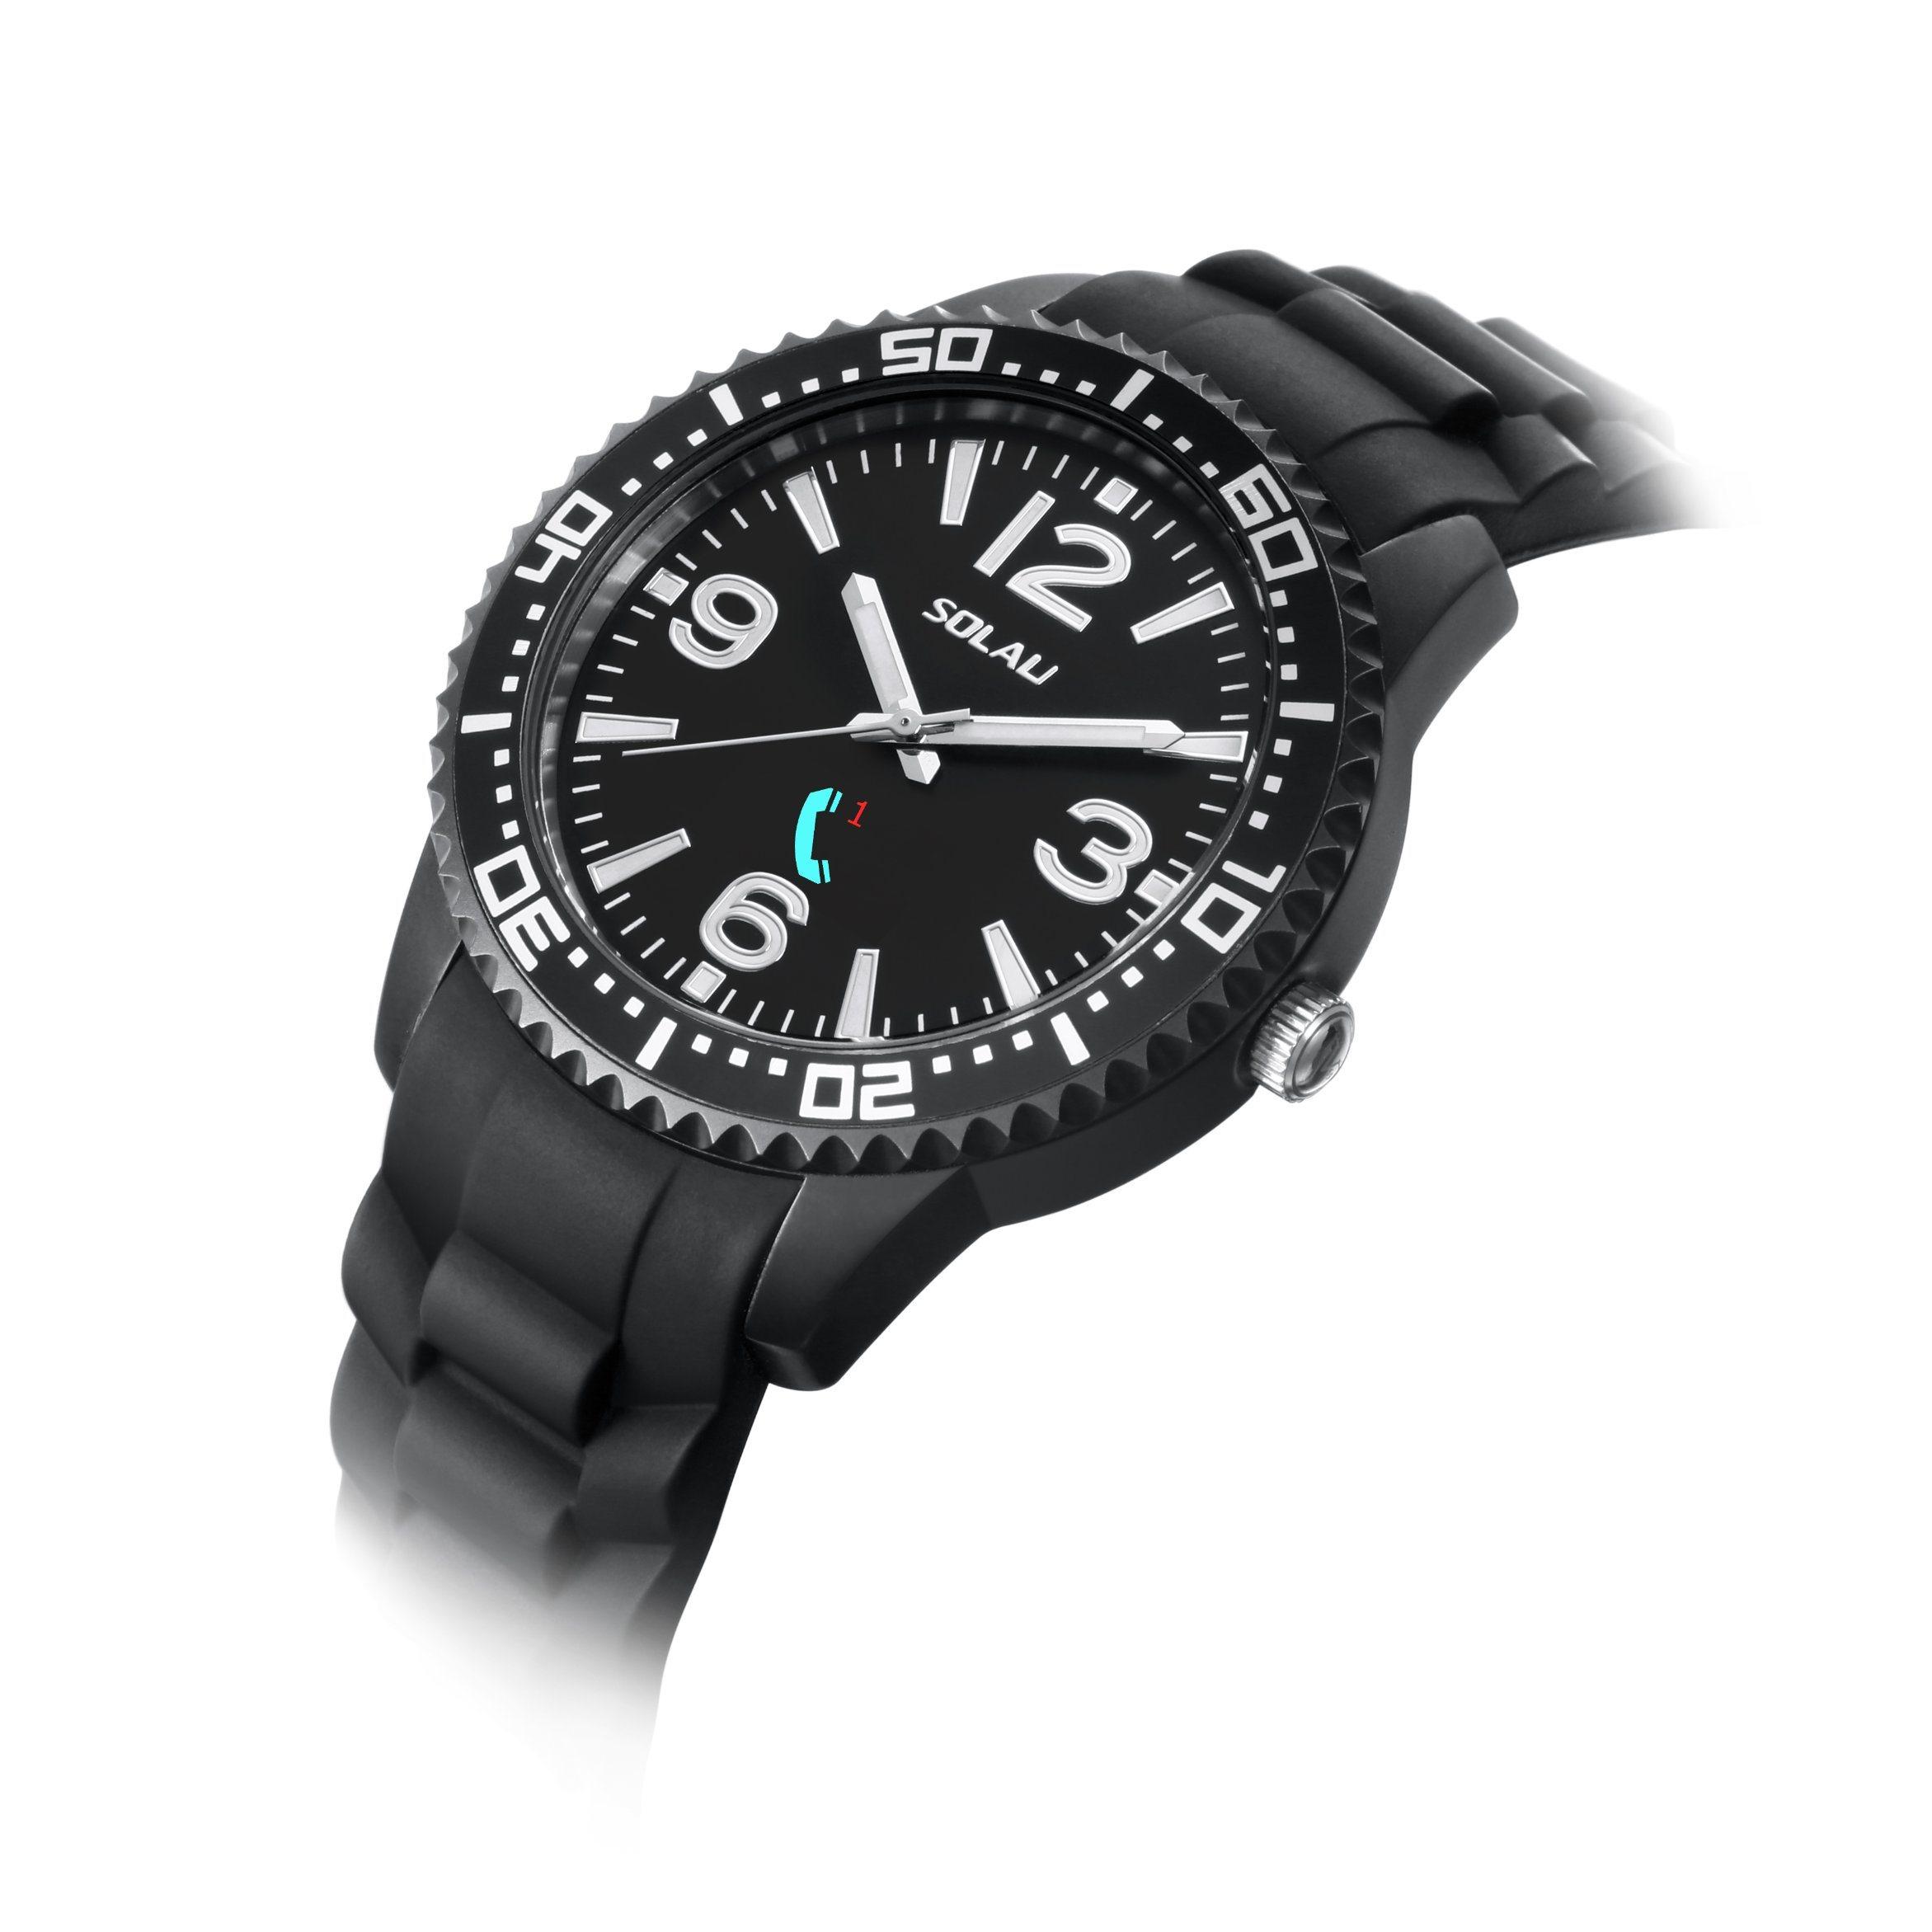 Popular Smart Quartz Watch SL-U81 Waterproof Bluetooth Smart Watch